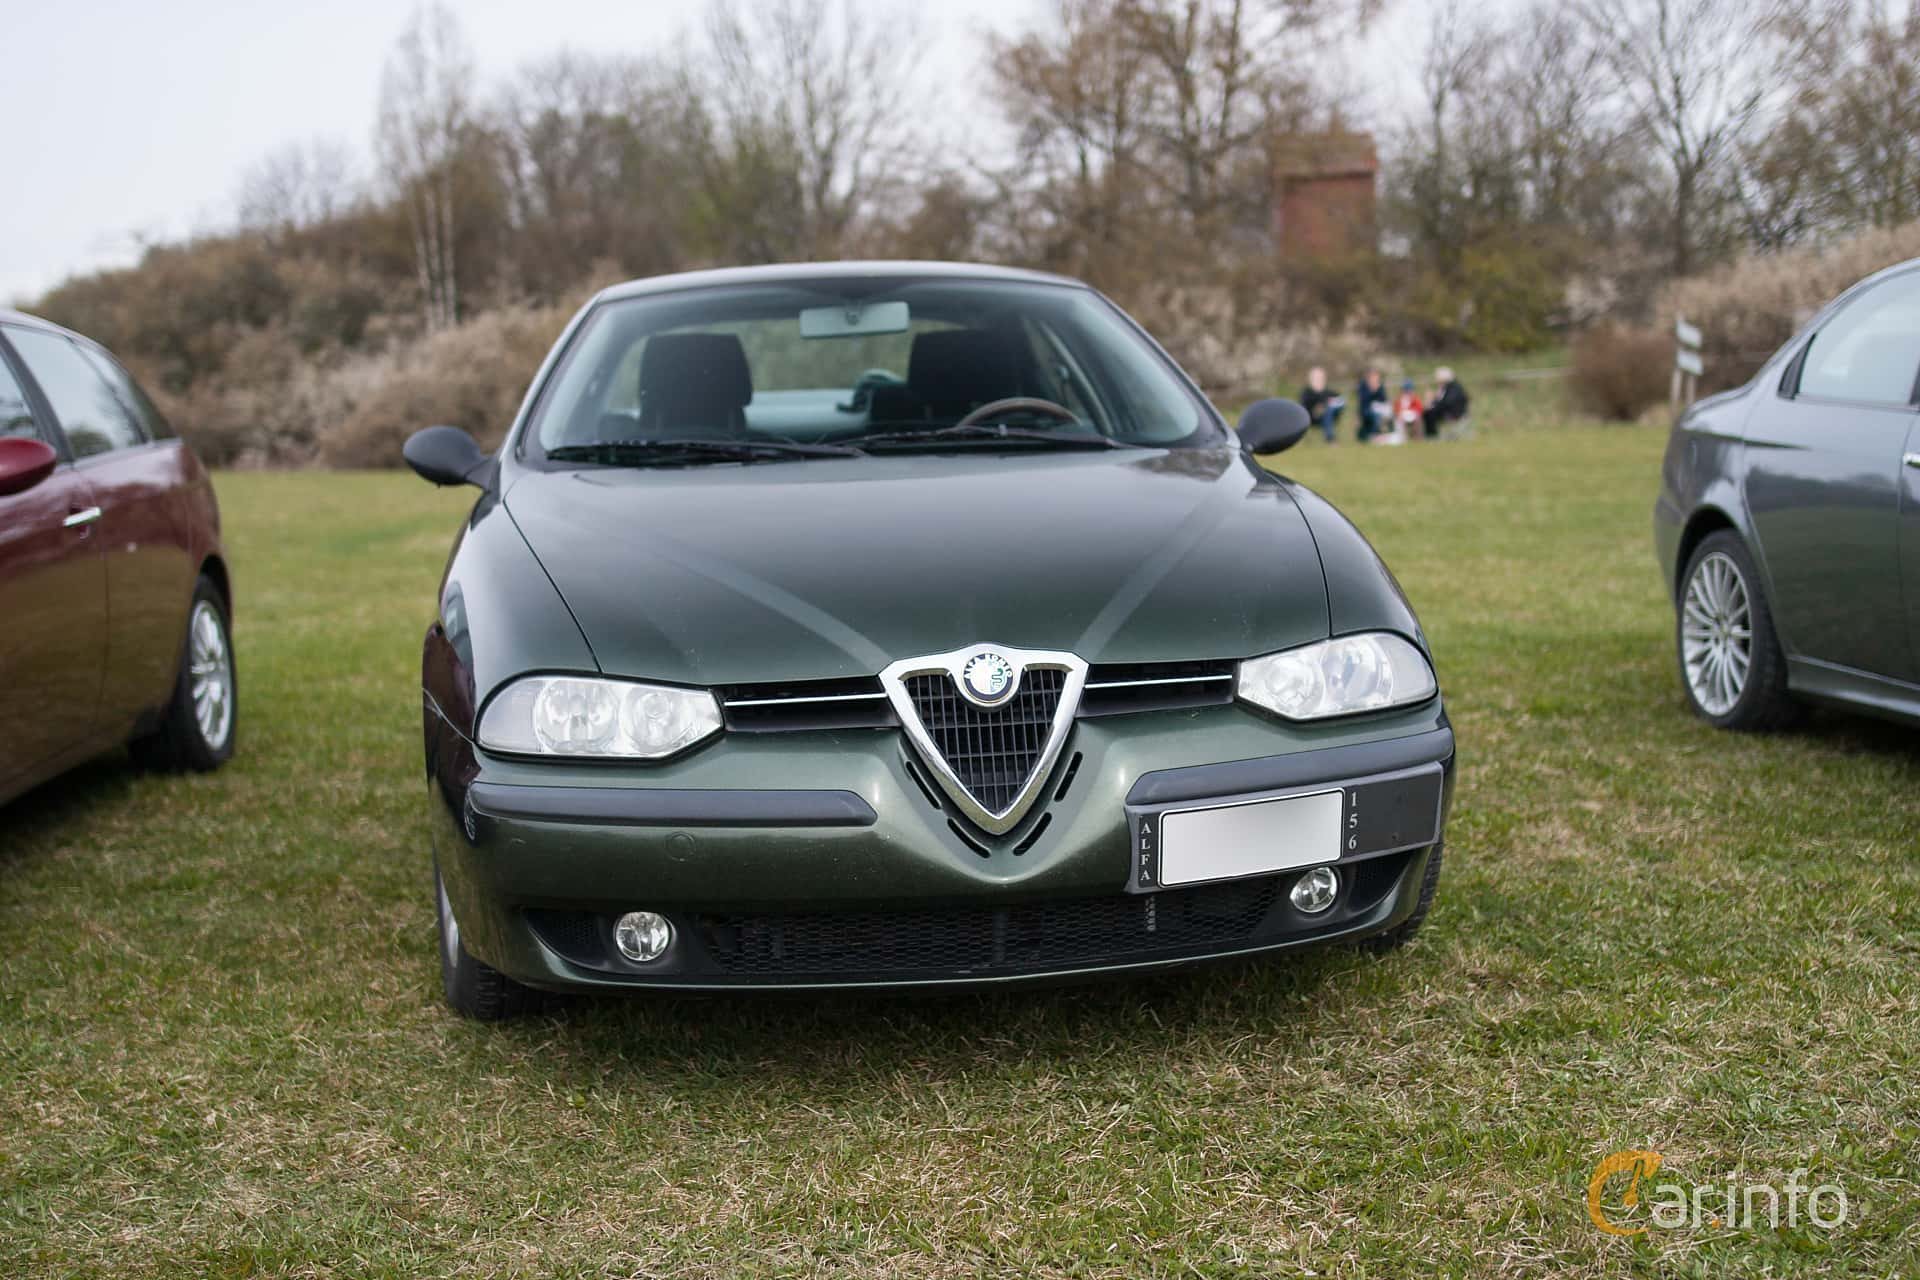 2 images of alfa romeo 156 2 0 ts manual 155hp 1998 by rh car info Alfa Romeo 147 Alfa Romeo Stradale